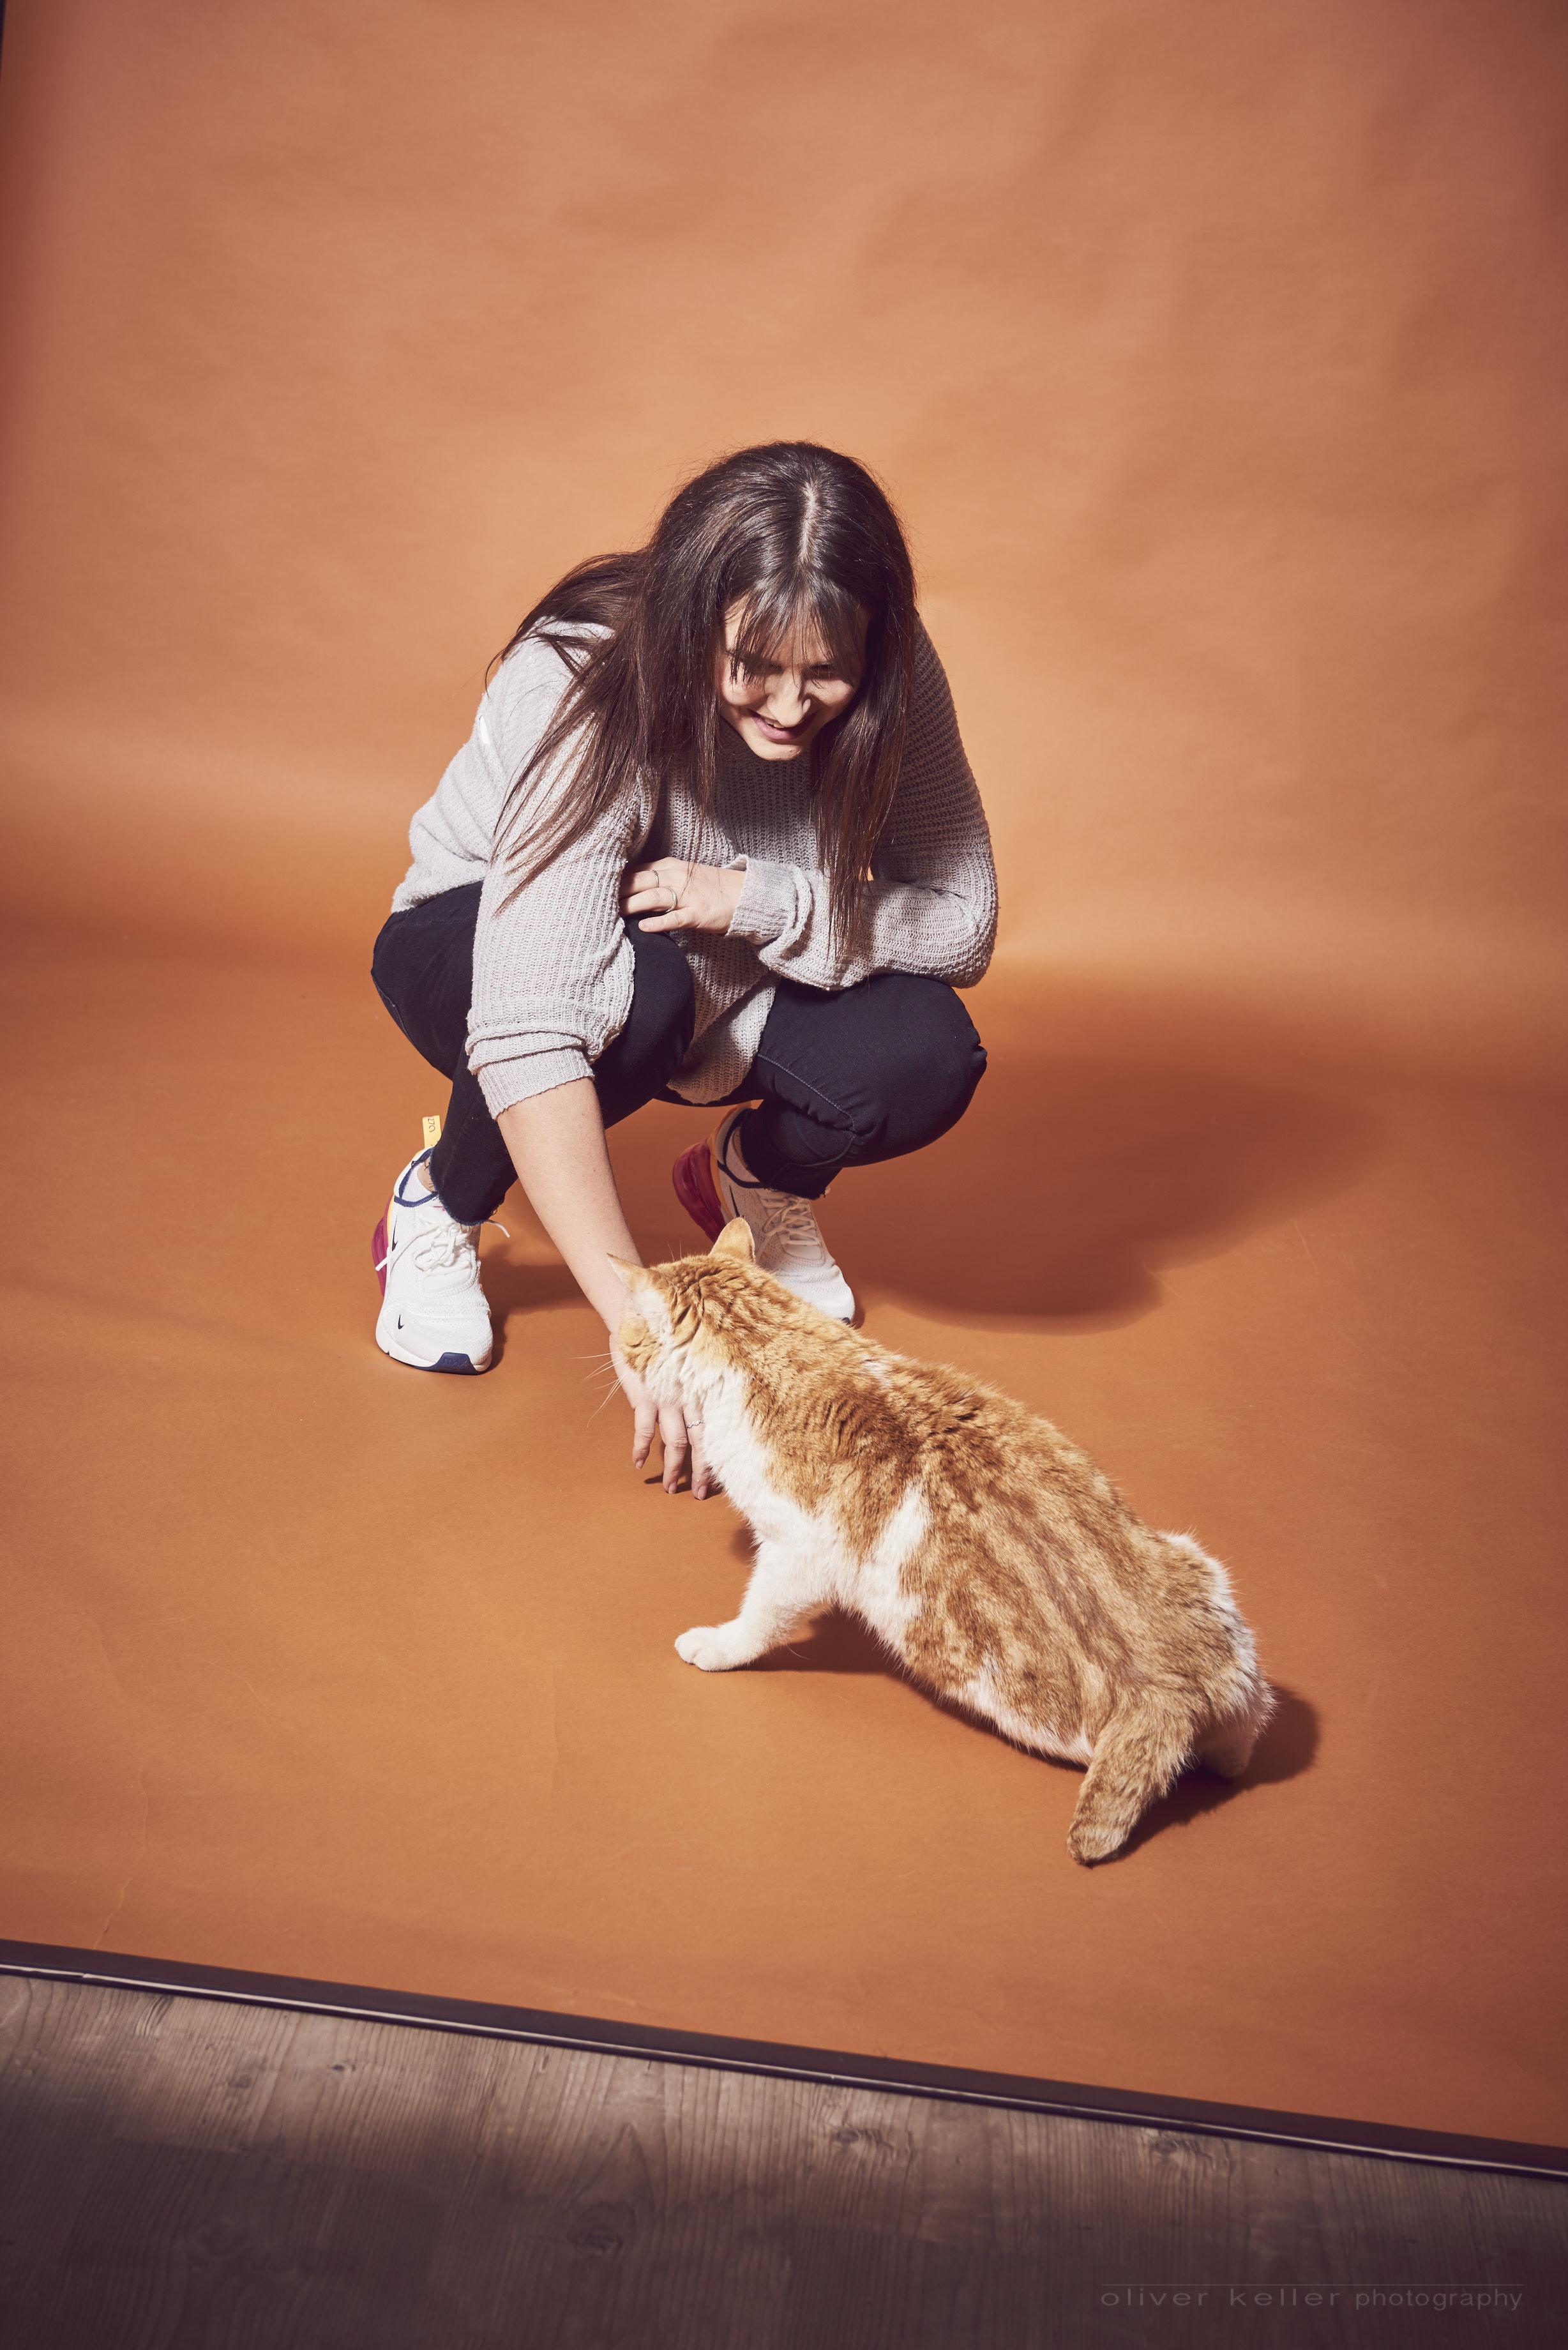 2019-04-15-Janina-animal2927.jpg